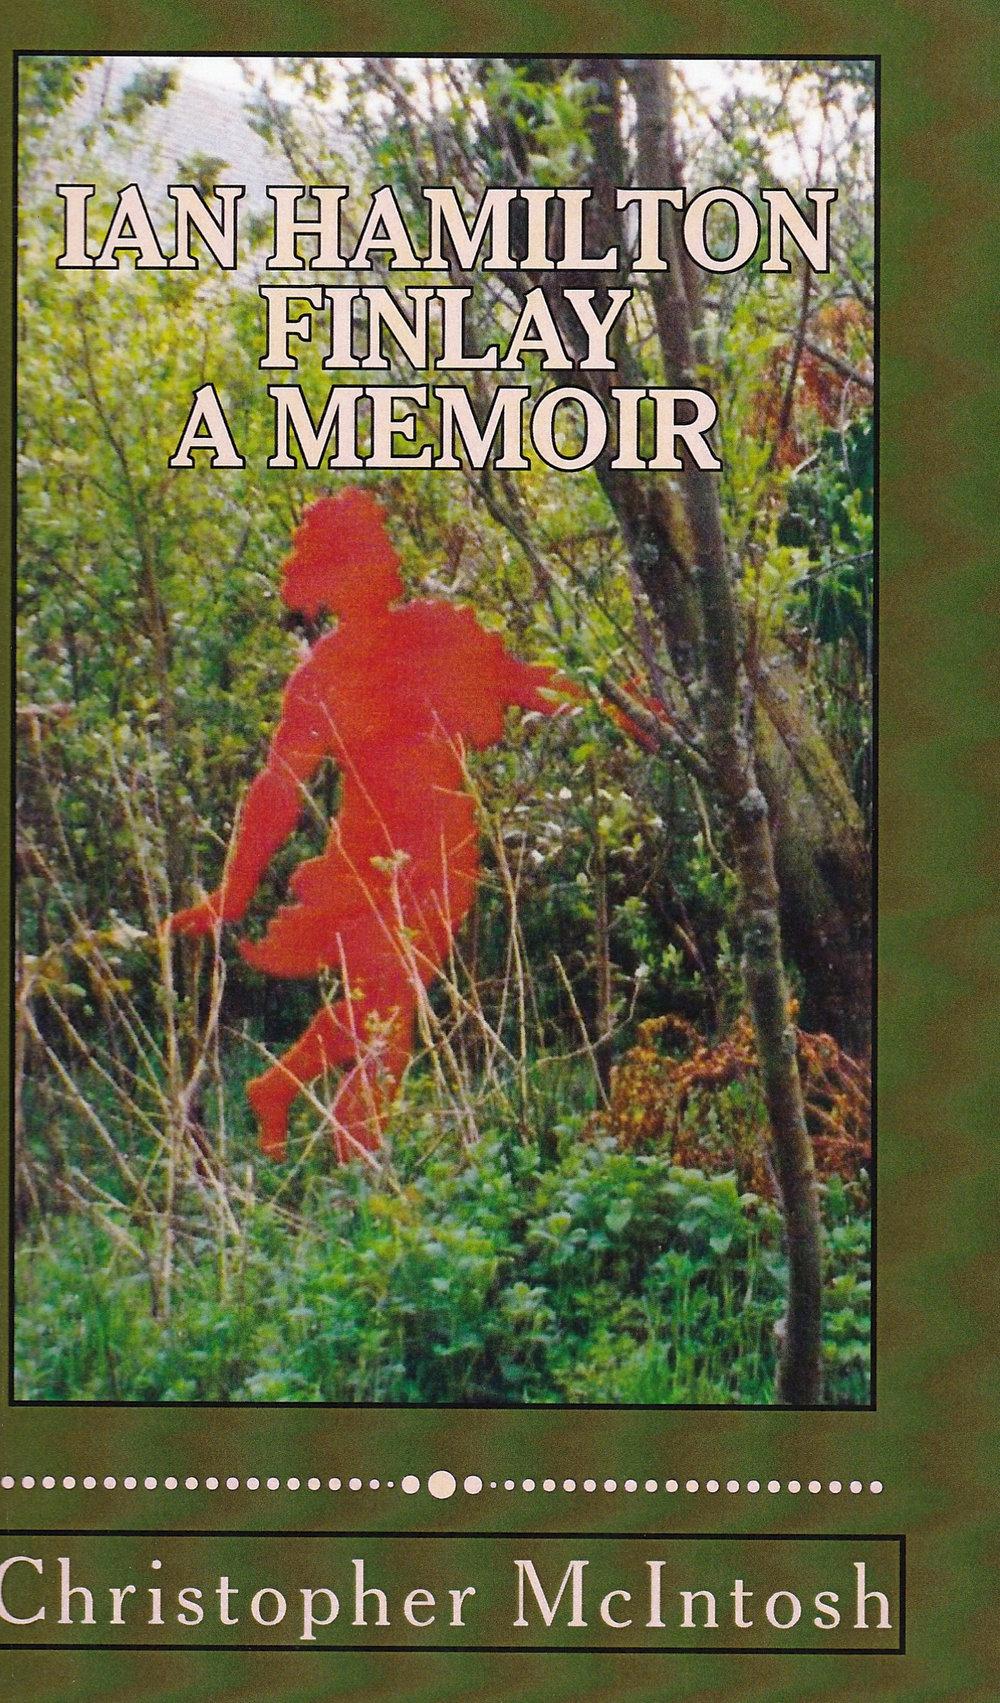 Ian Hamilton Finlay: a Memoir (Vanadis Texts, 2014).